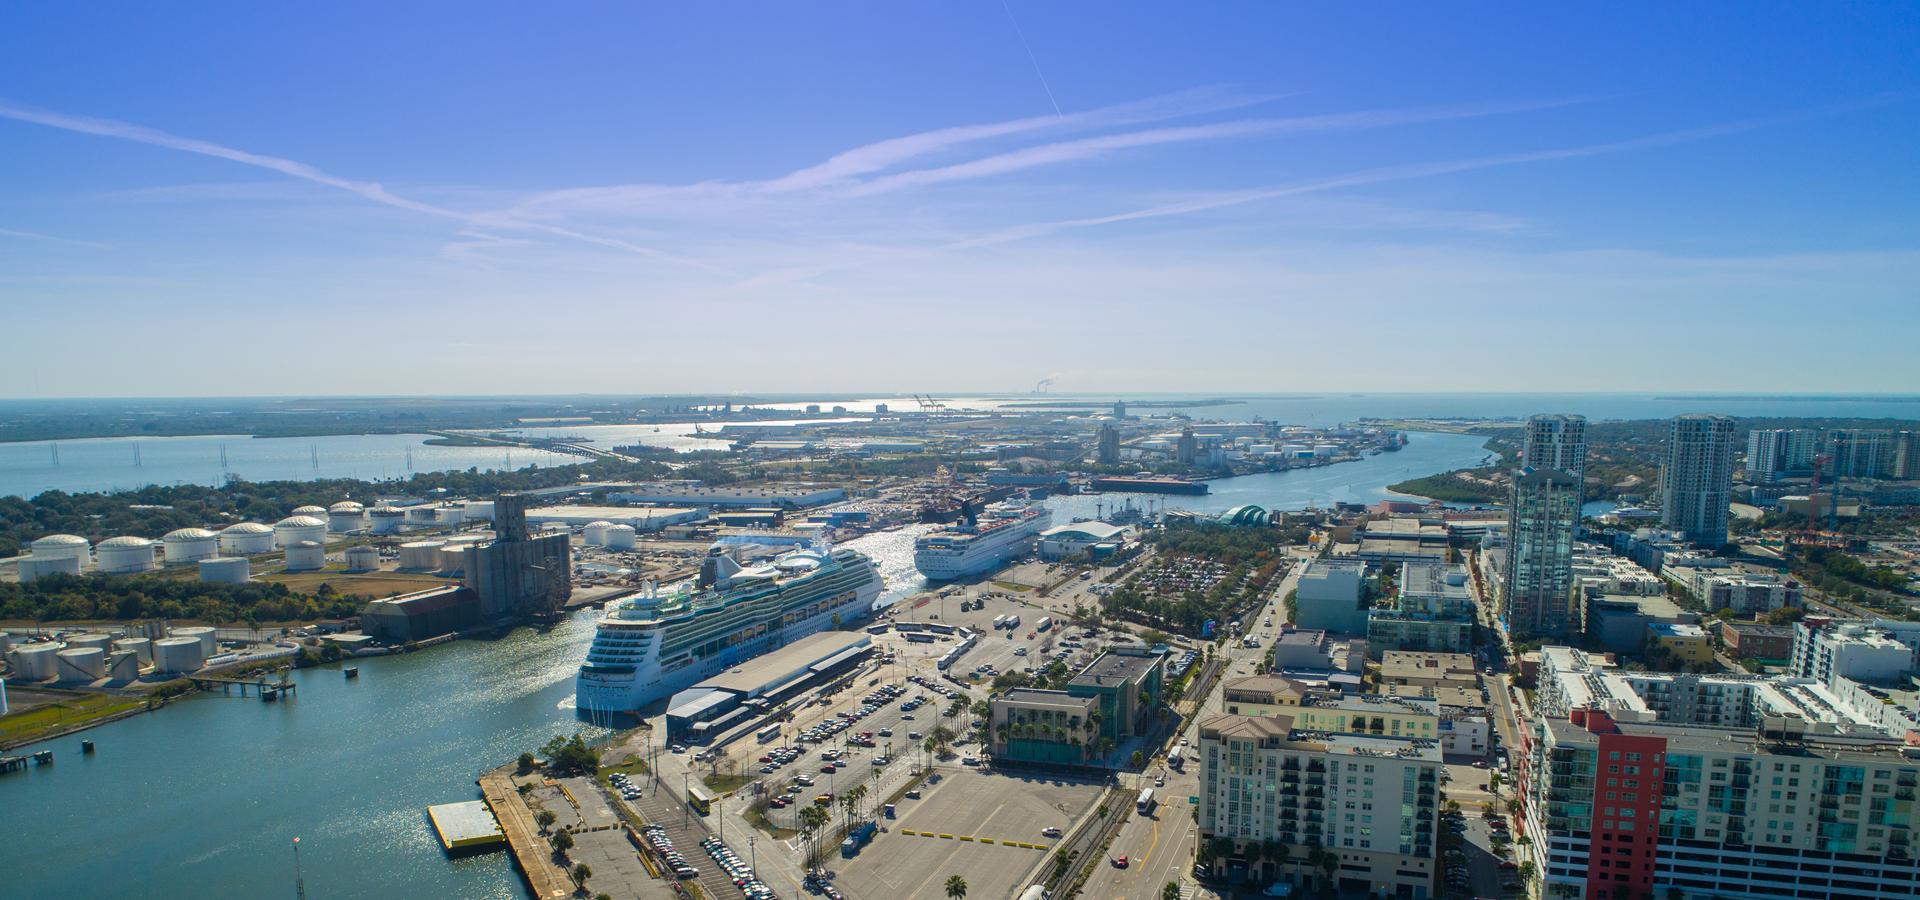 Peer-to-peer advisory in Tampa, Tampa Bay, Florida, USA